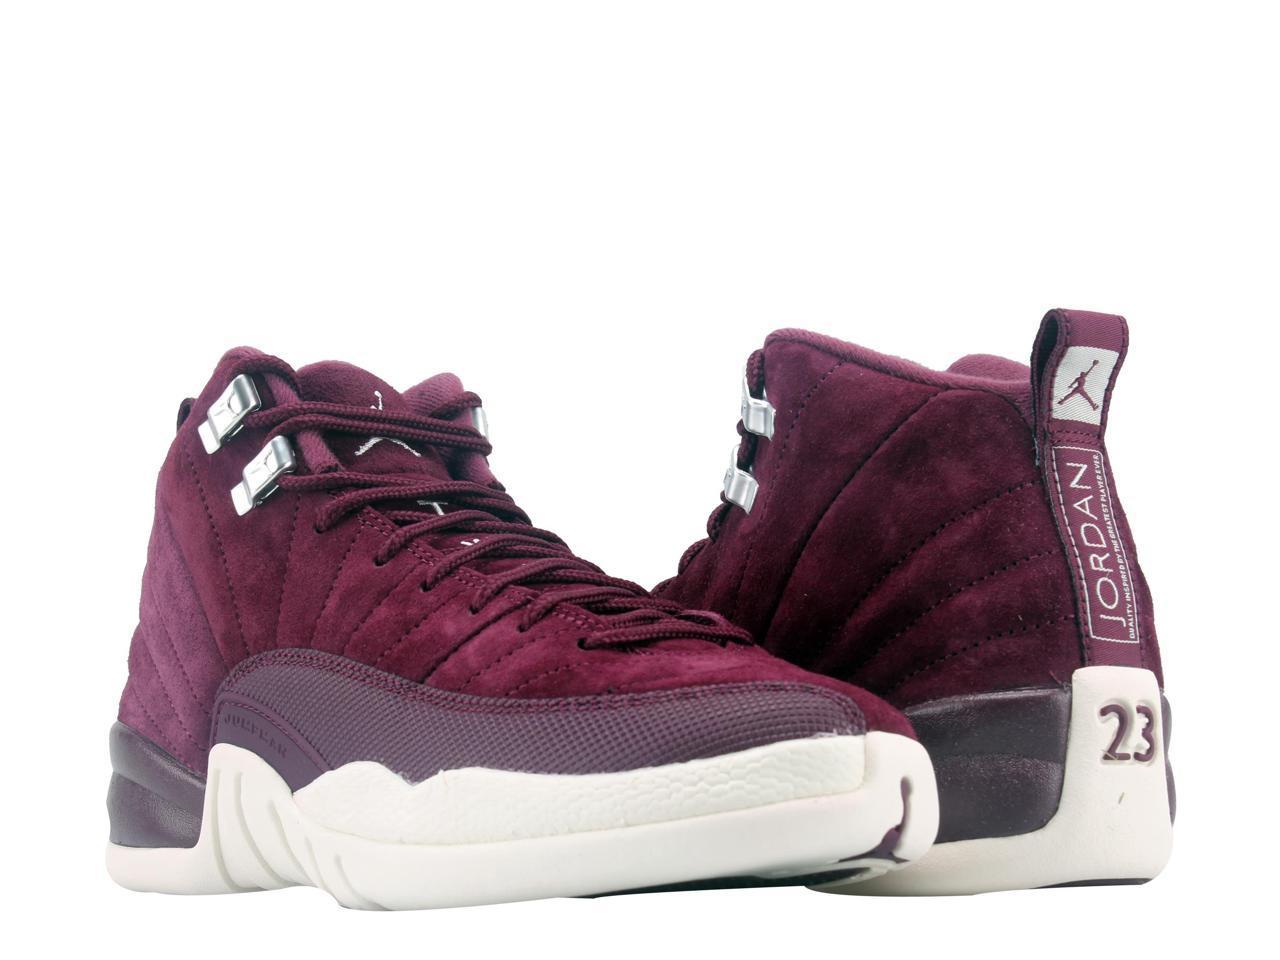 c17f6a97cba8c5 ... wholesale nike bg air jordan 12 retro bg nike bordeaux sail big kids basketball  shoes 130690